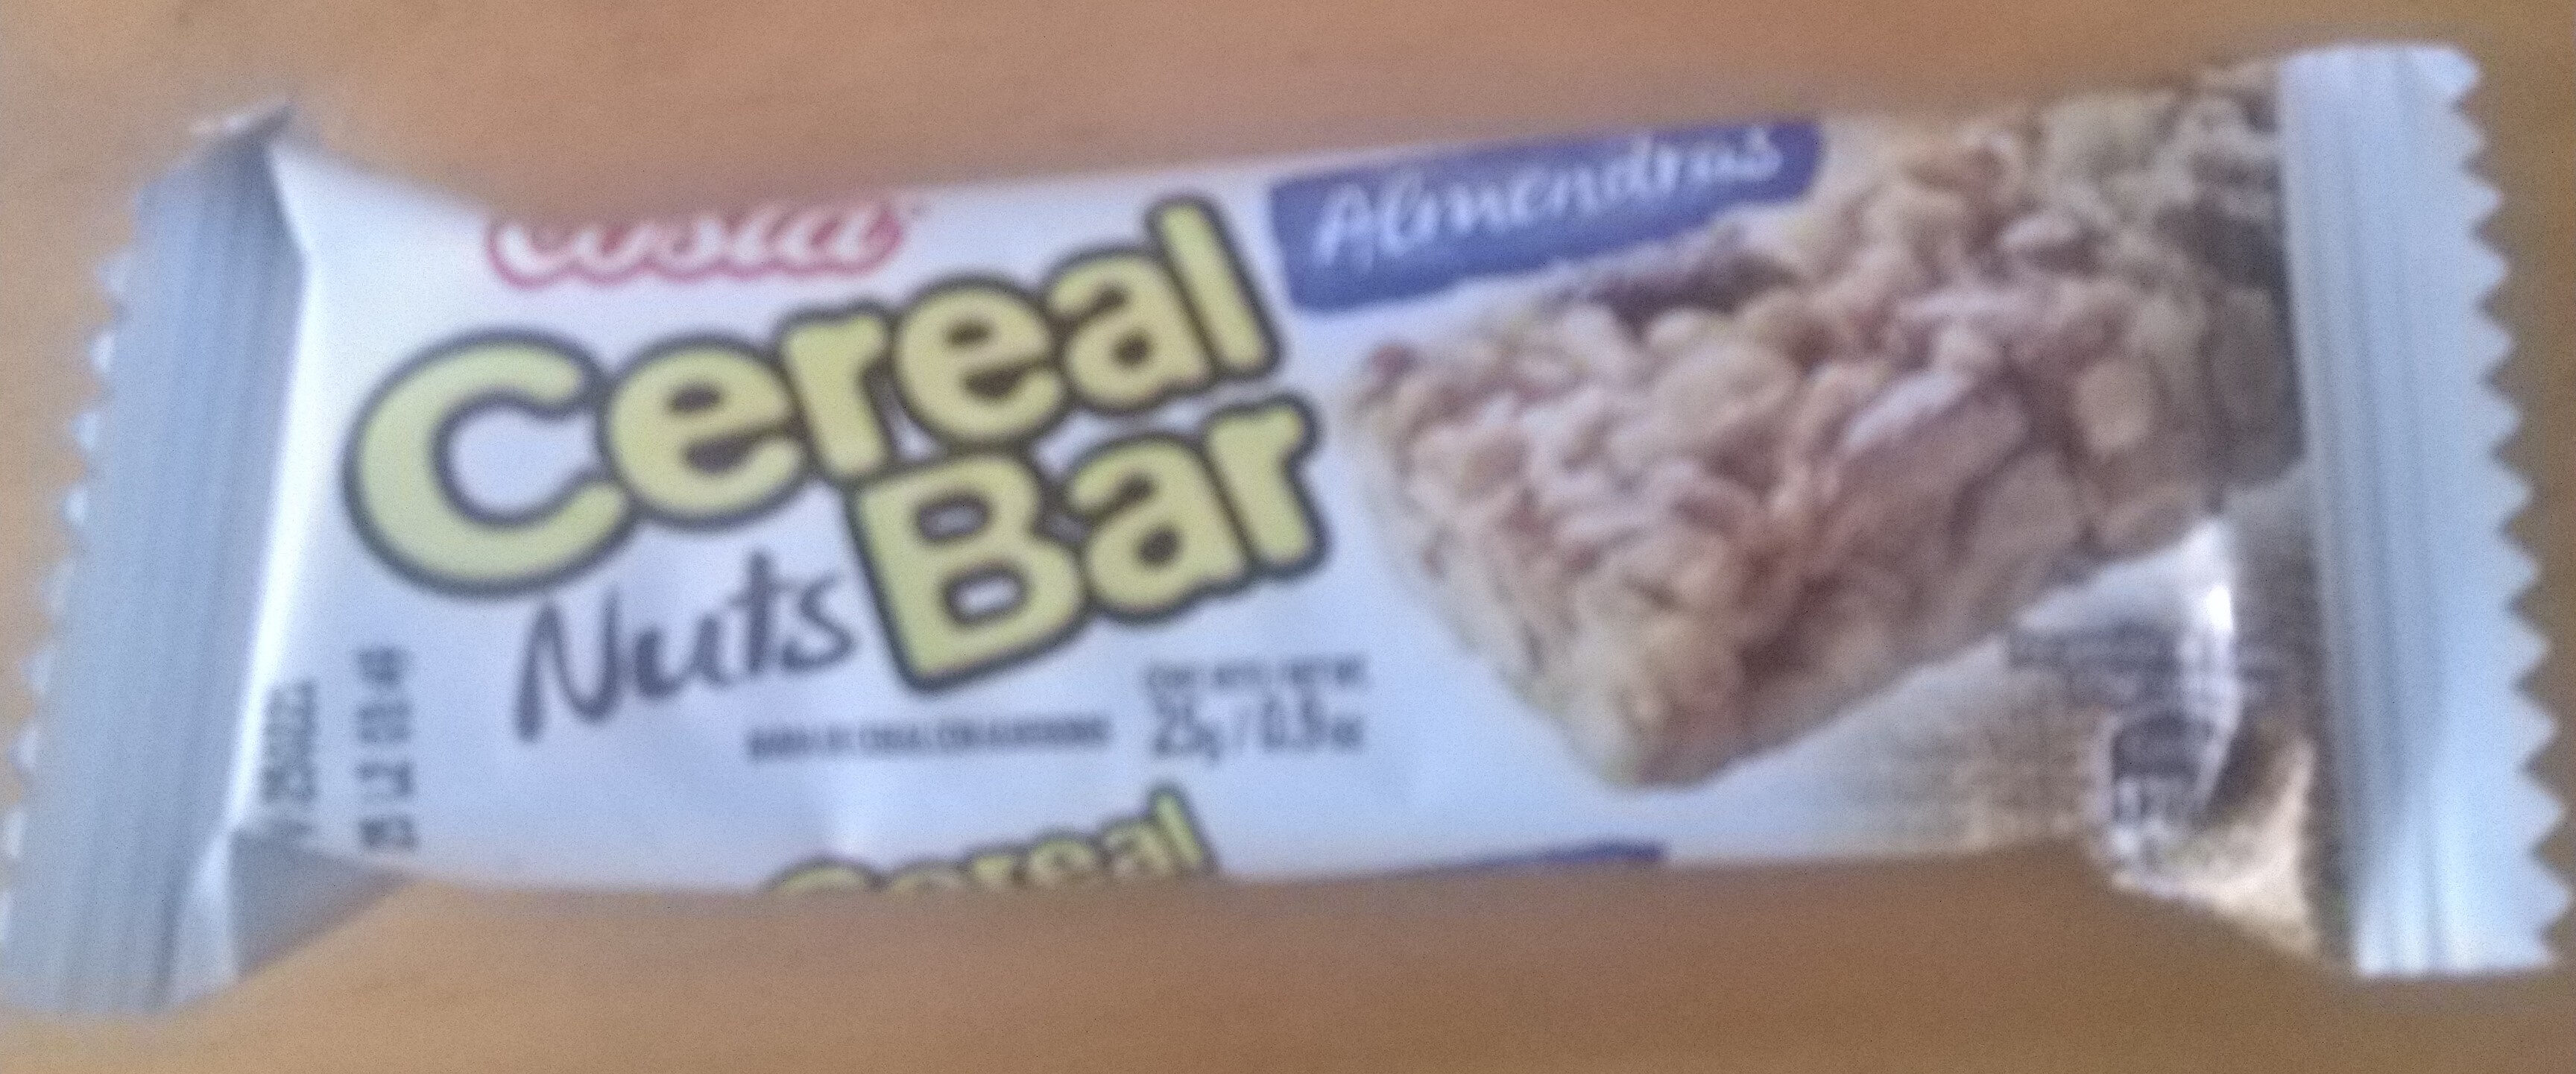 Cereal Bar Nuts Almendras - Product - es